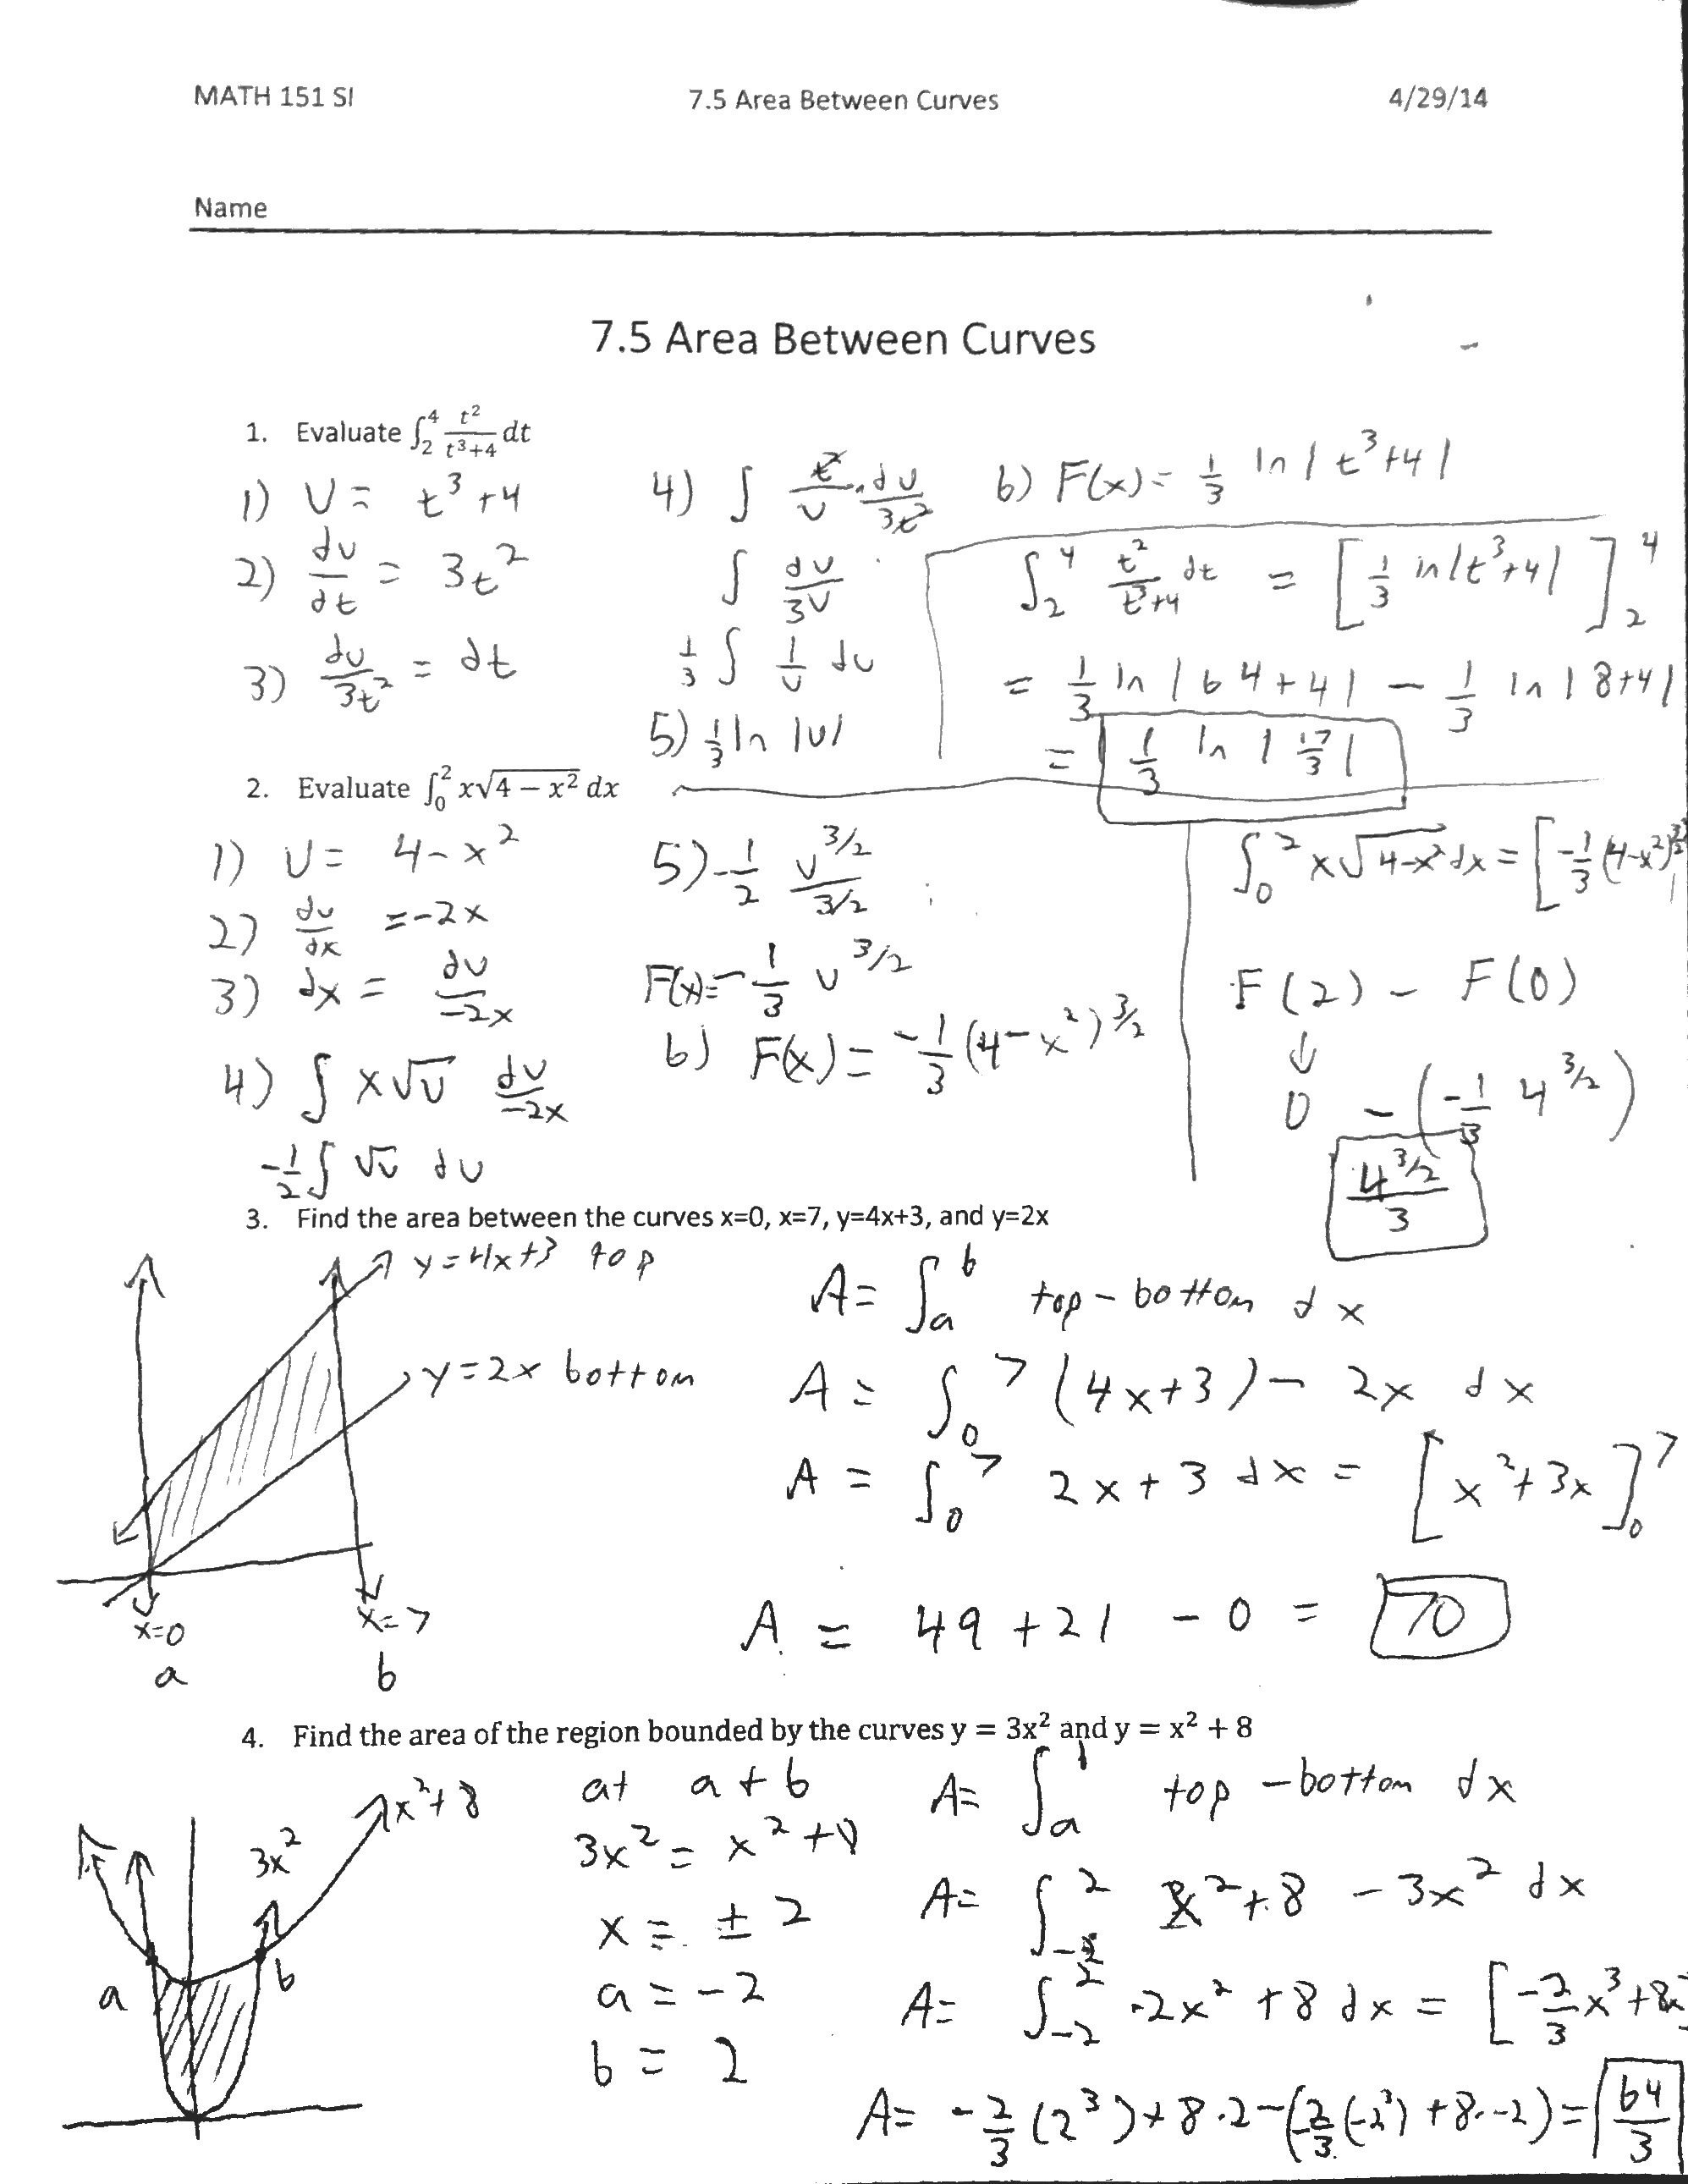 Math 151 Supplemental Instruction